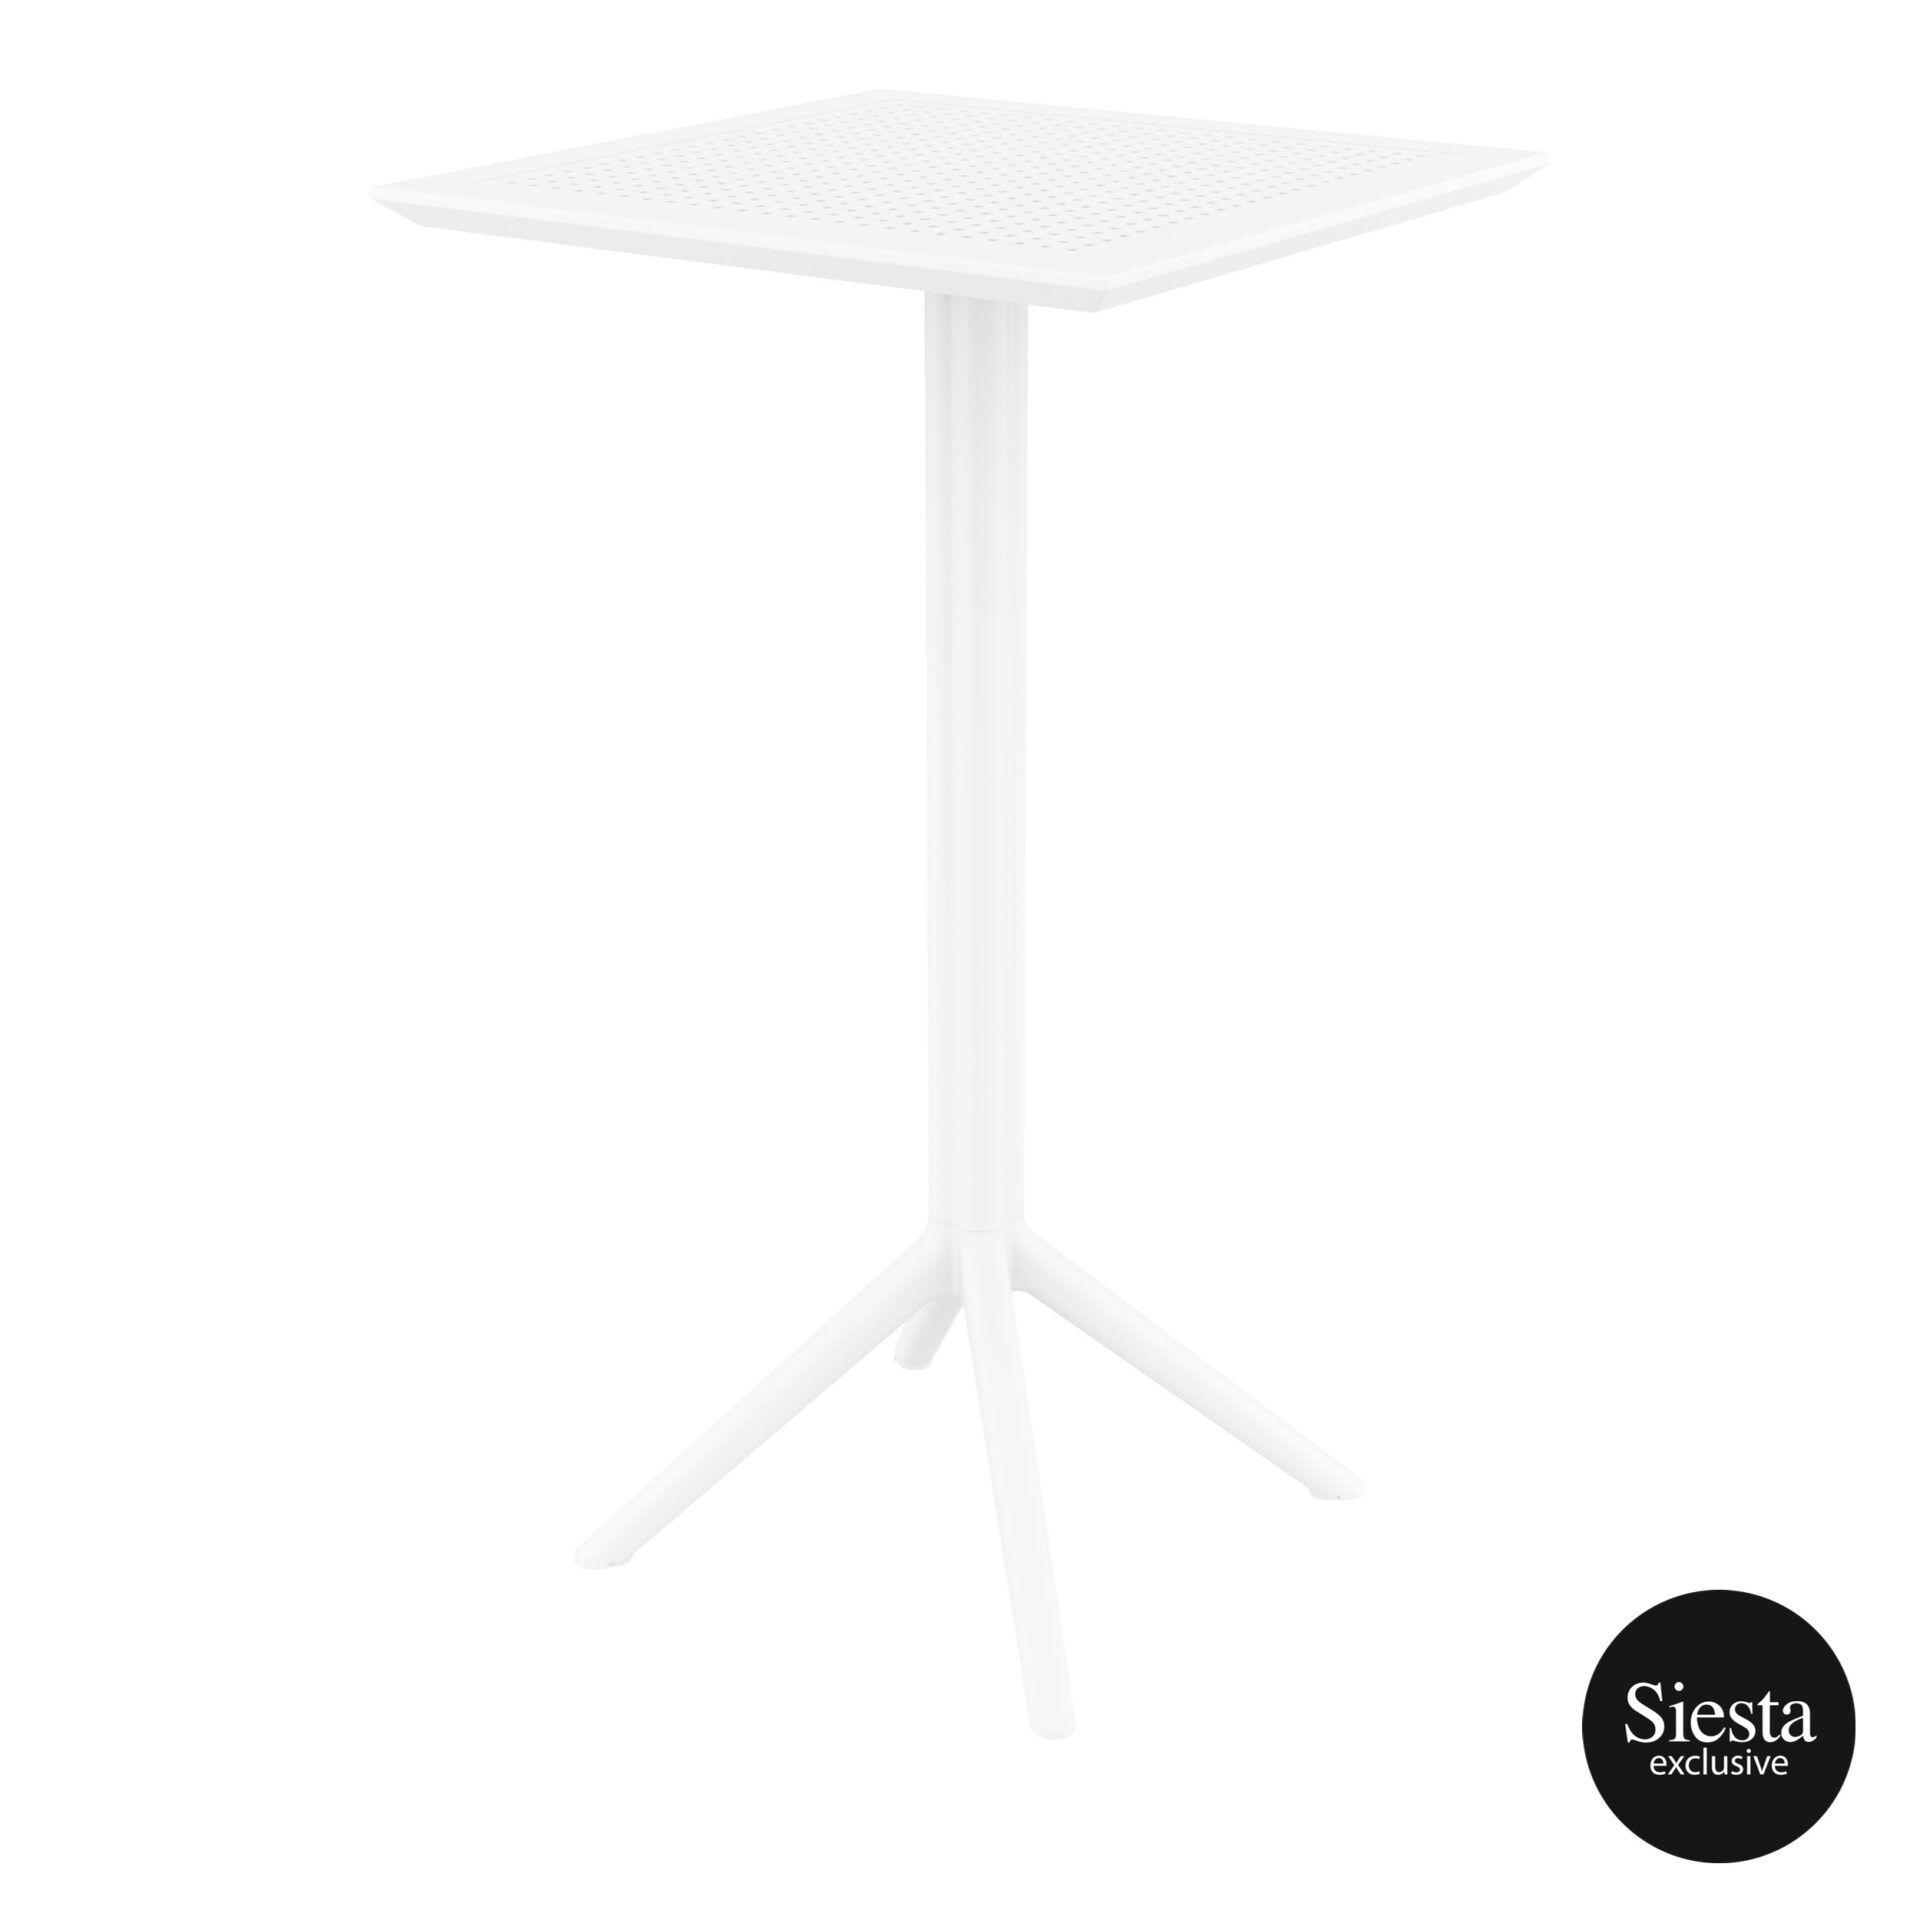 polypropylene outdoor sky folding bar table 60 white front side 2